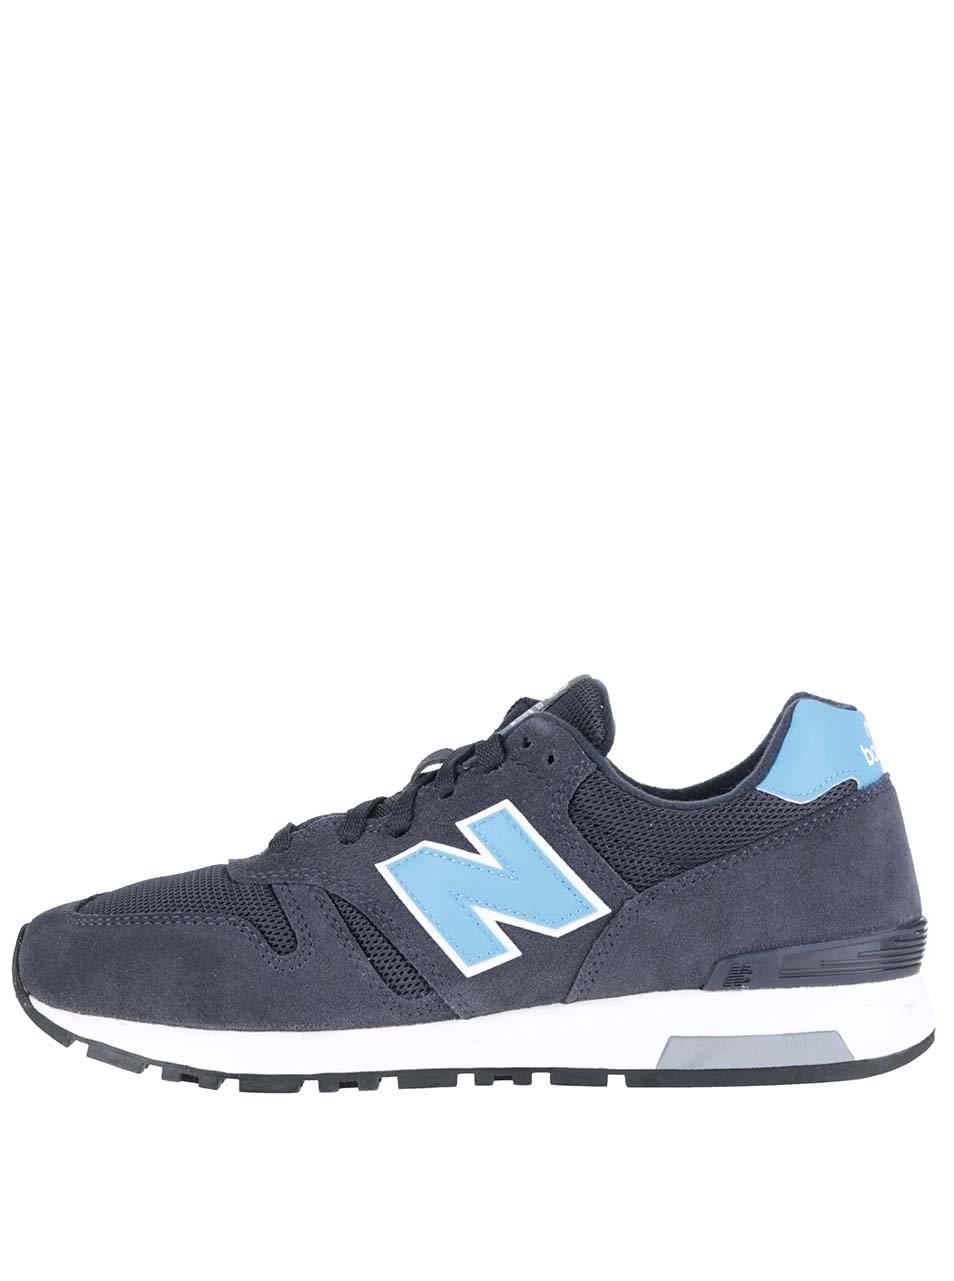 Modro-sivé pánske kožené tenisky New Balance ... c265927a38d